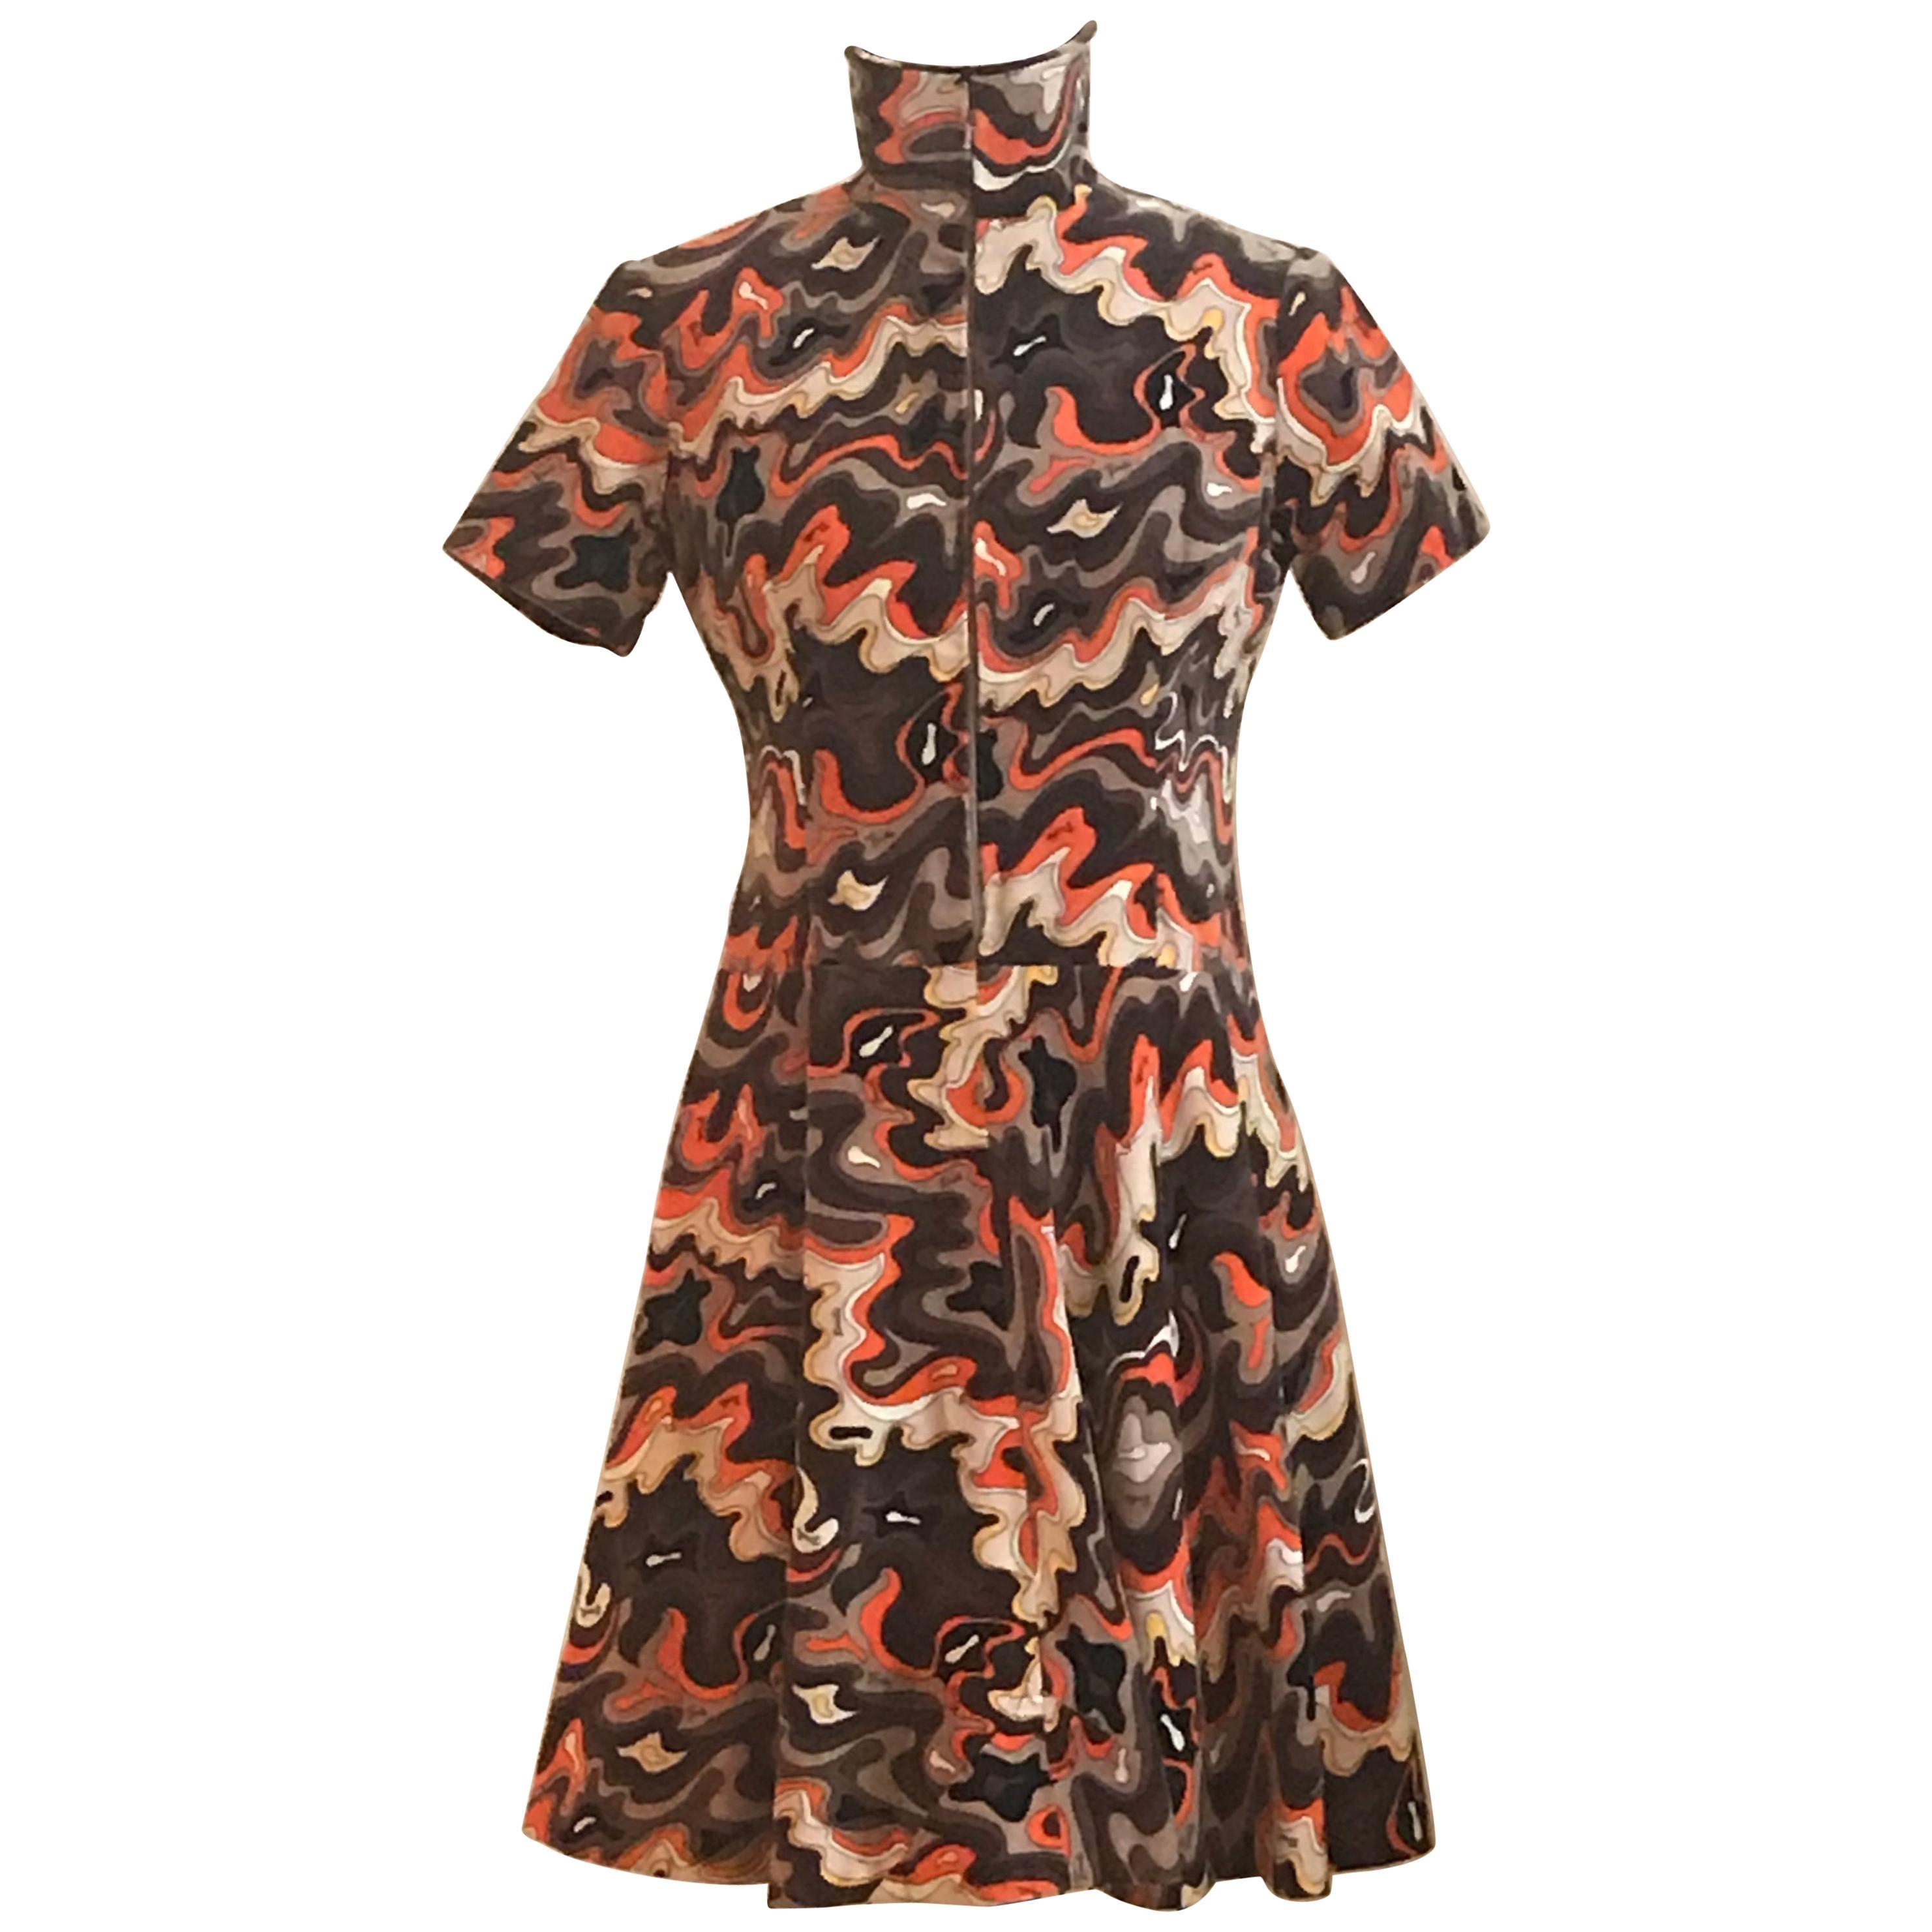 Emilio Pucci 1960s Orange and Brown Squiggle Print Velvet Zip Front Dress